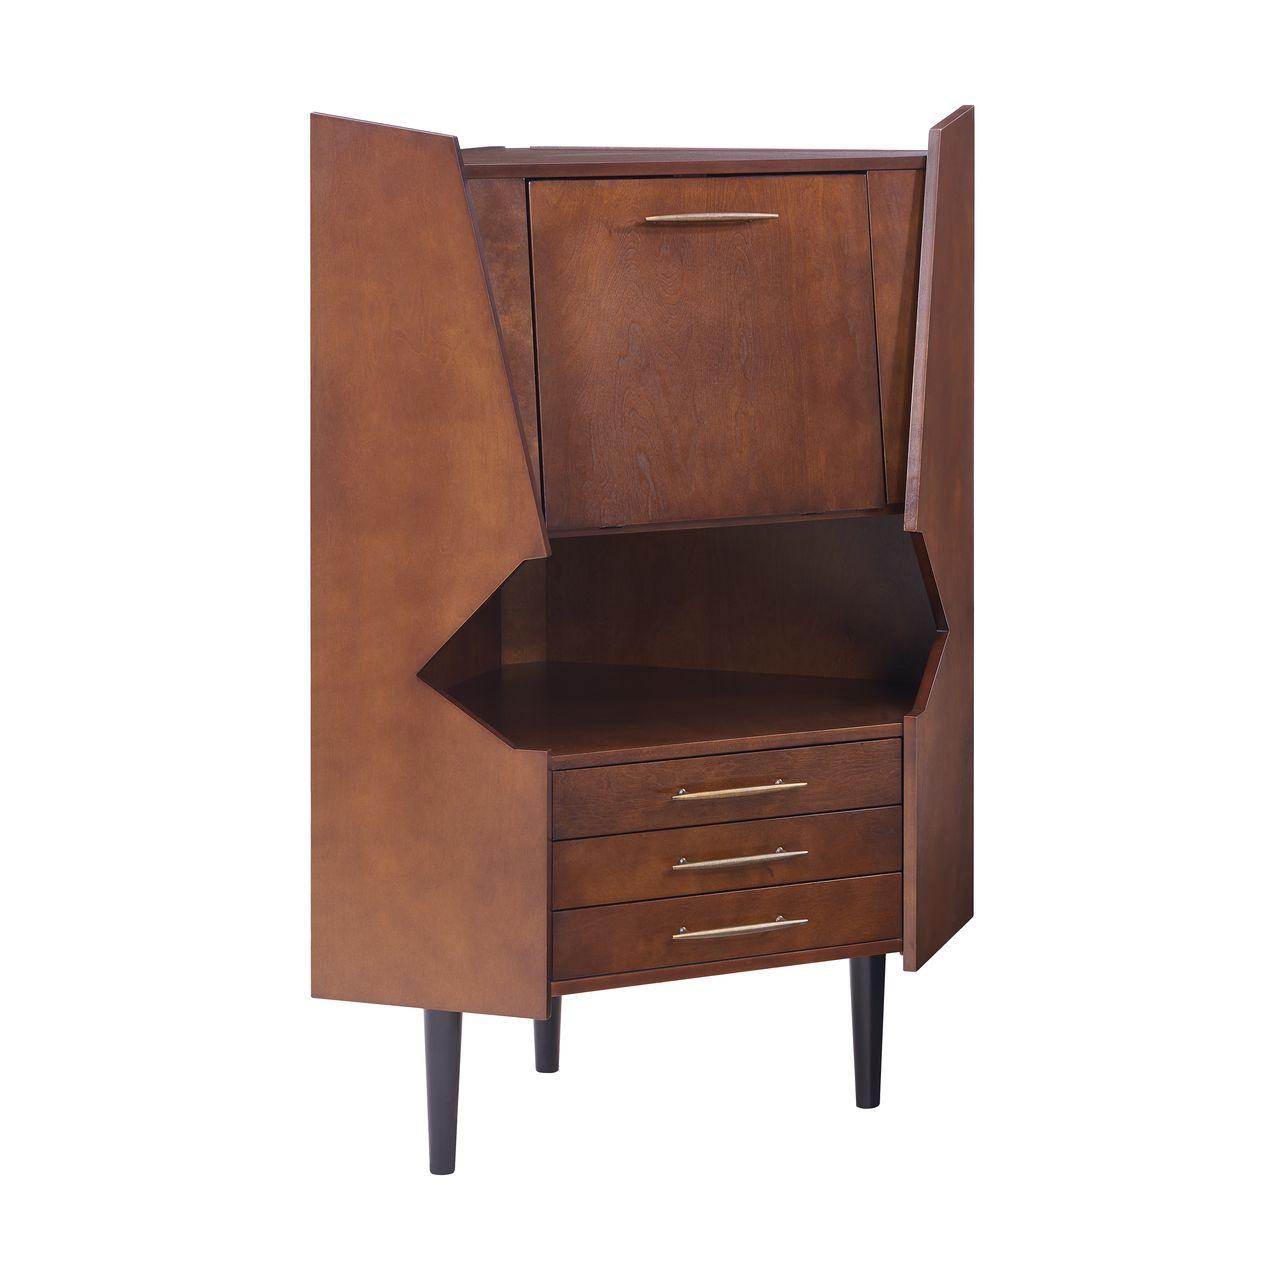 SEI Larson Corner Storage Bar Cabinet in Dark Tobacco / Black